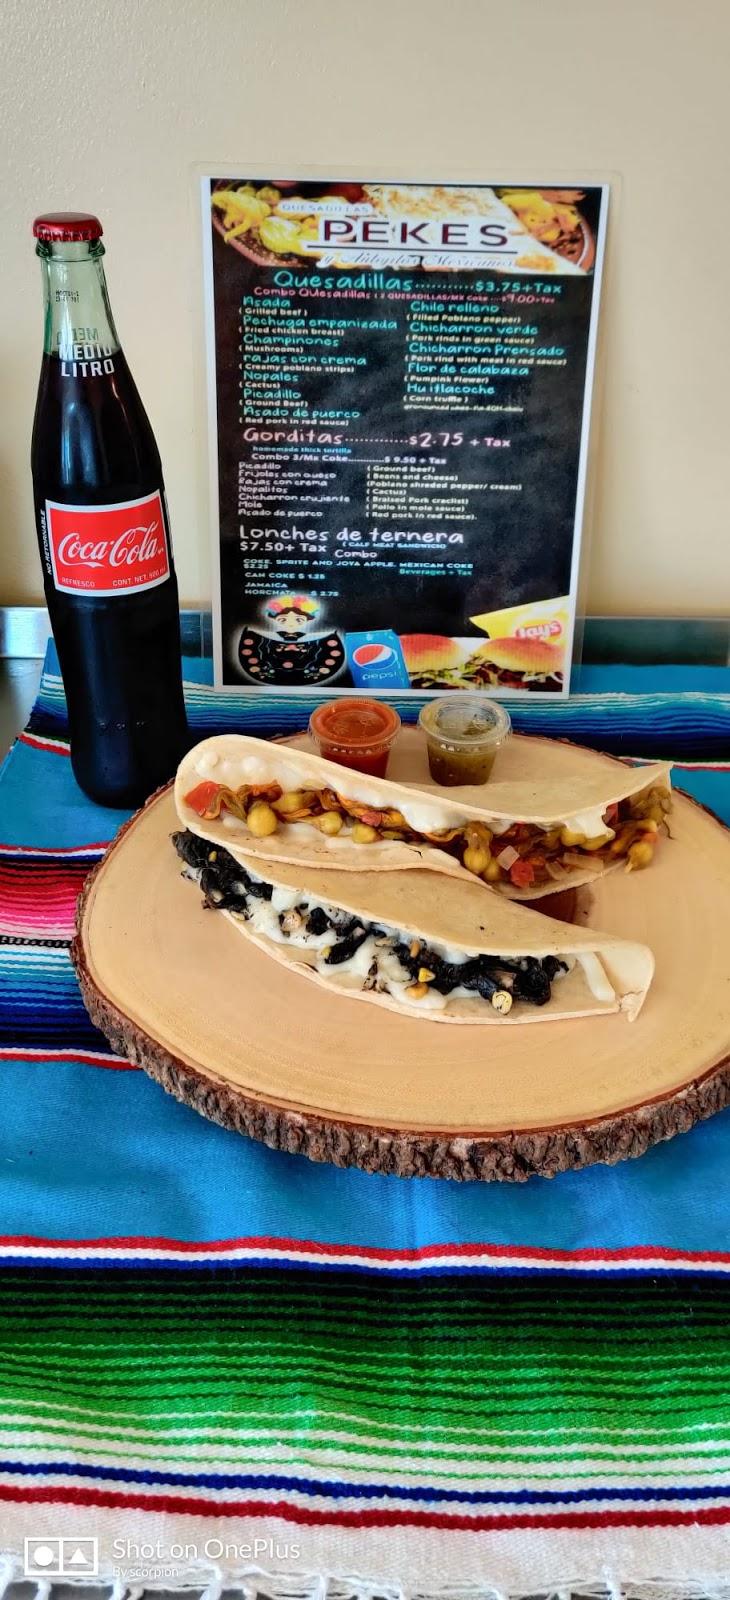 Quesadilla Pekes | restaurant | 1124 E Villa Maria Rd, Bryan, TX 77802, USA | 9794851233 OR +1 979-485-1233